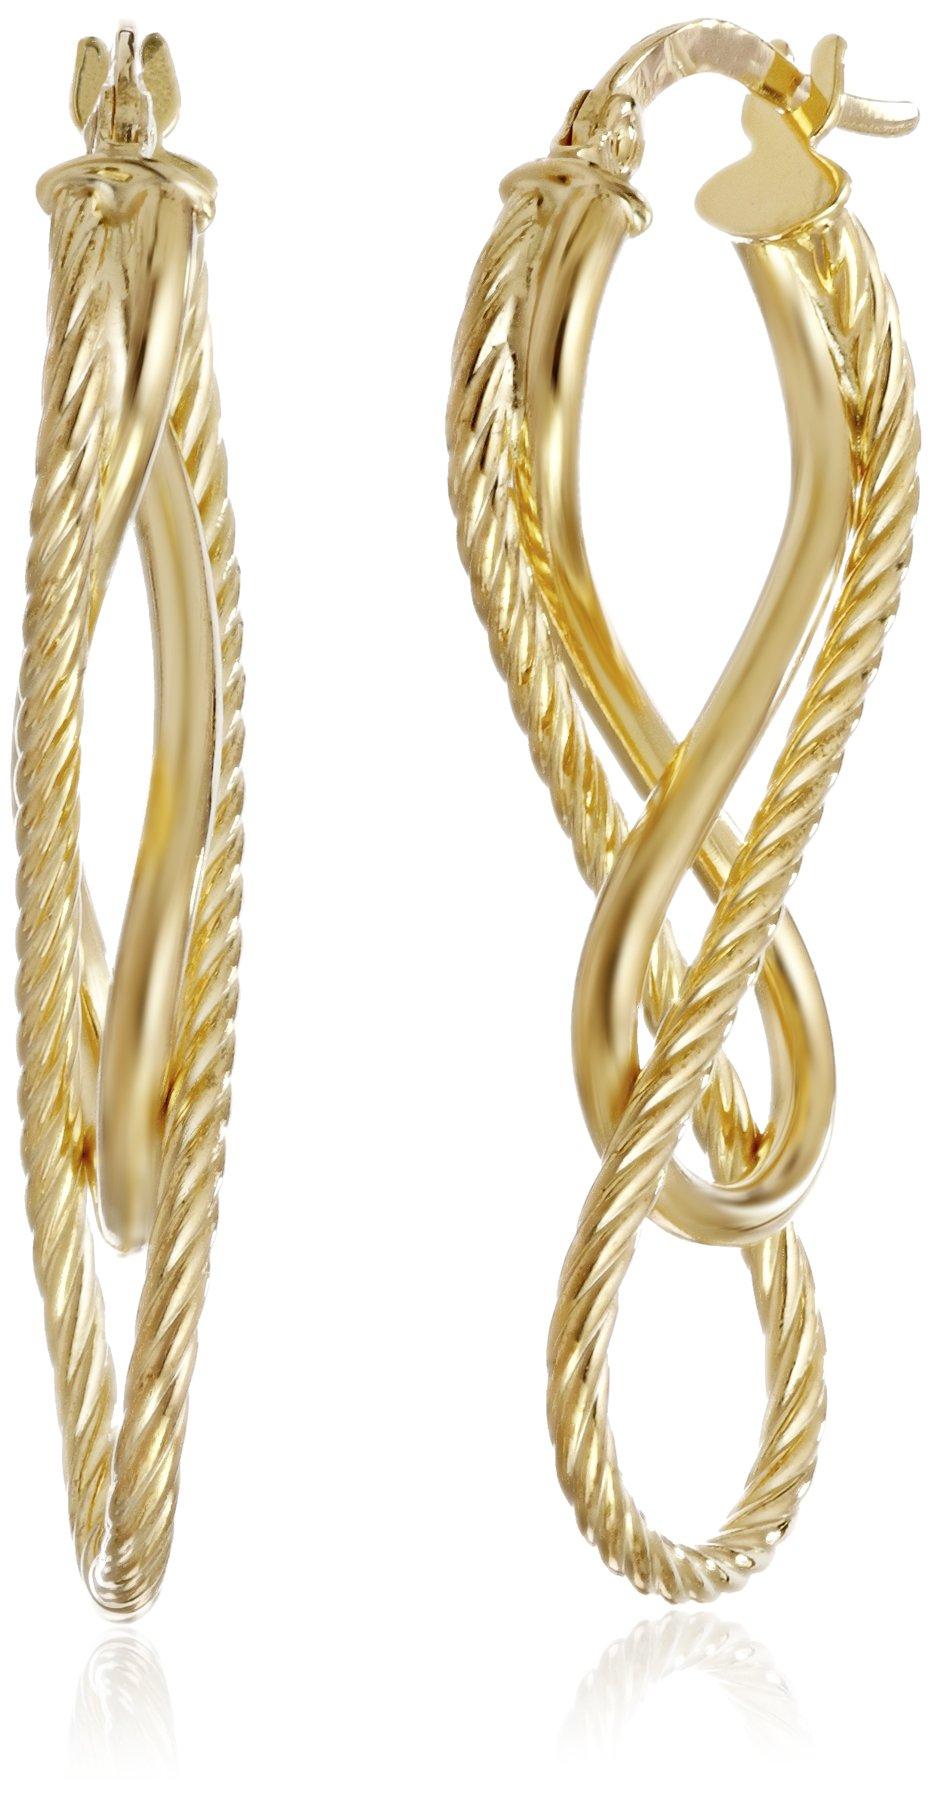 14k Yellow Gold Italian Diamond-Cut and High Polish Figure Eight Earrings